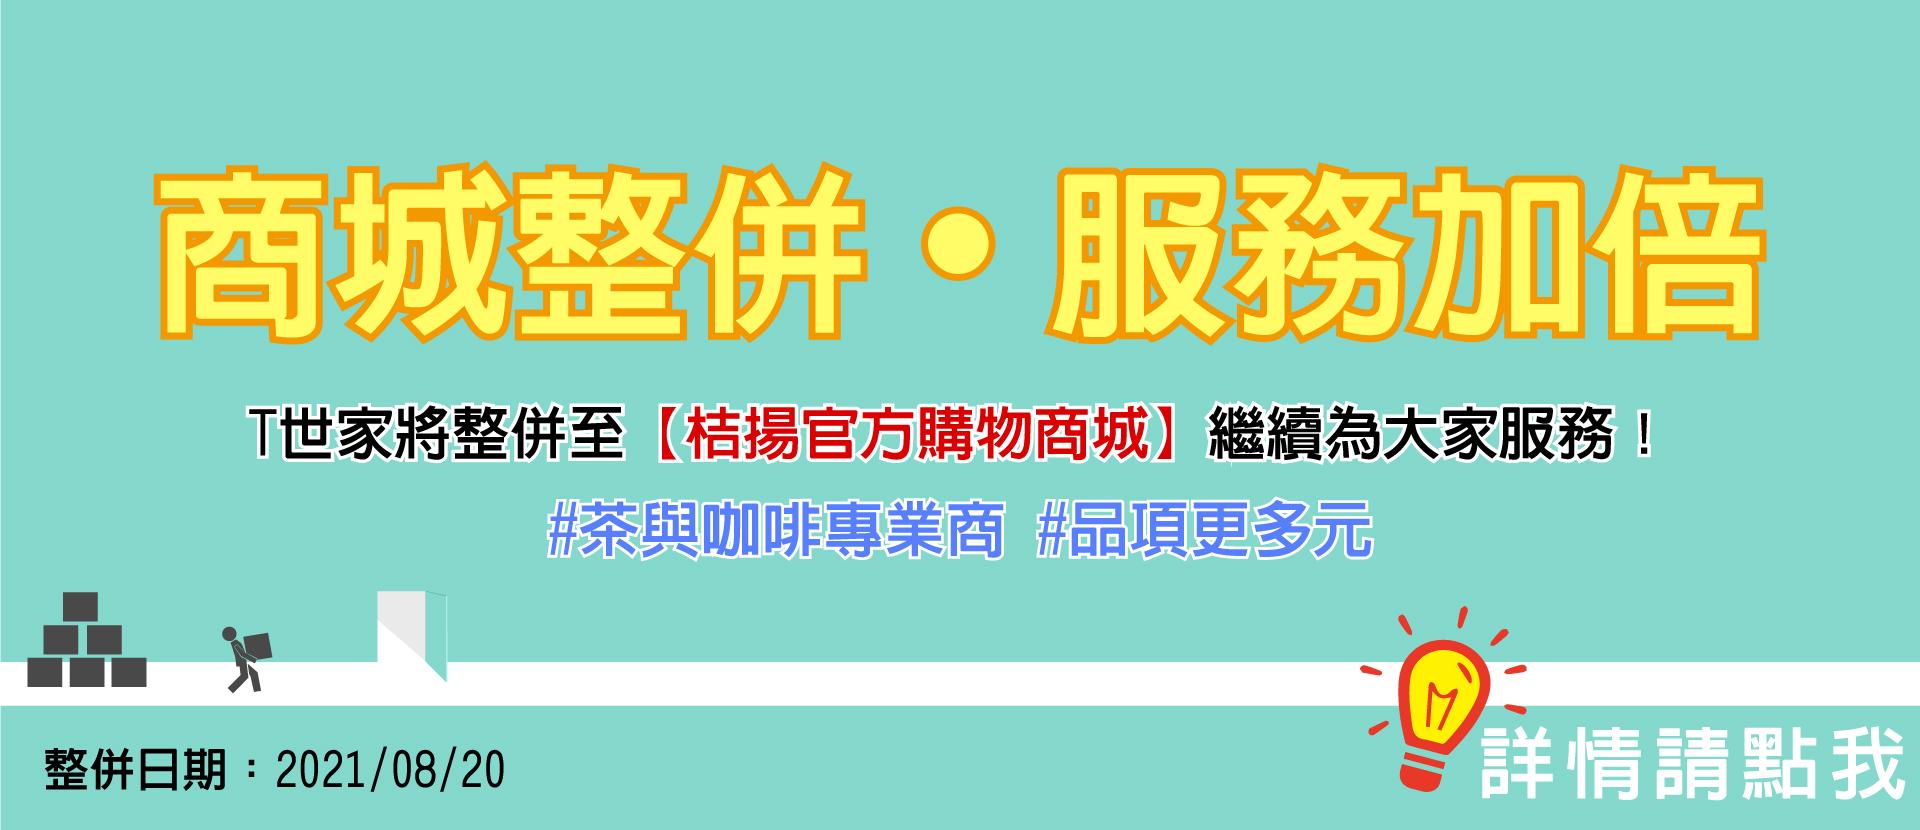 Trandition_Conversion_Goodyoung_Shop_Banner.jpg